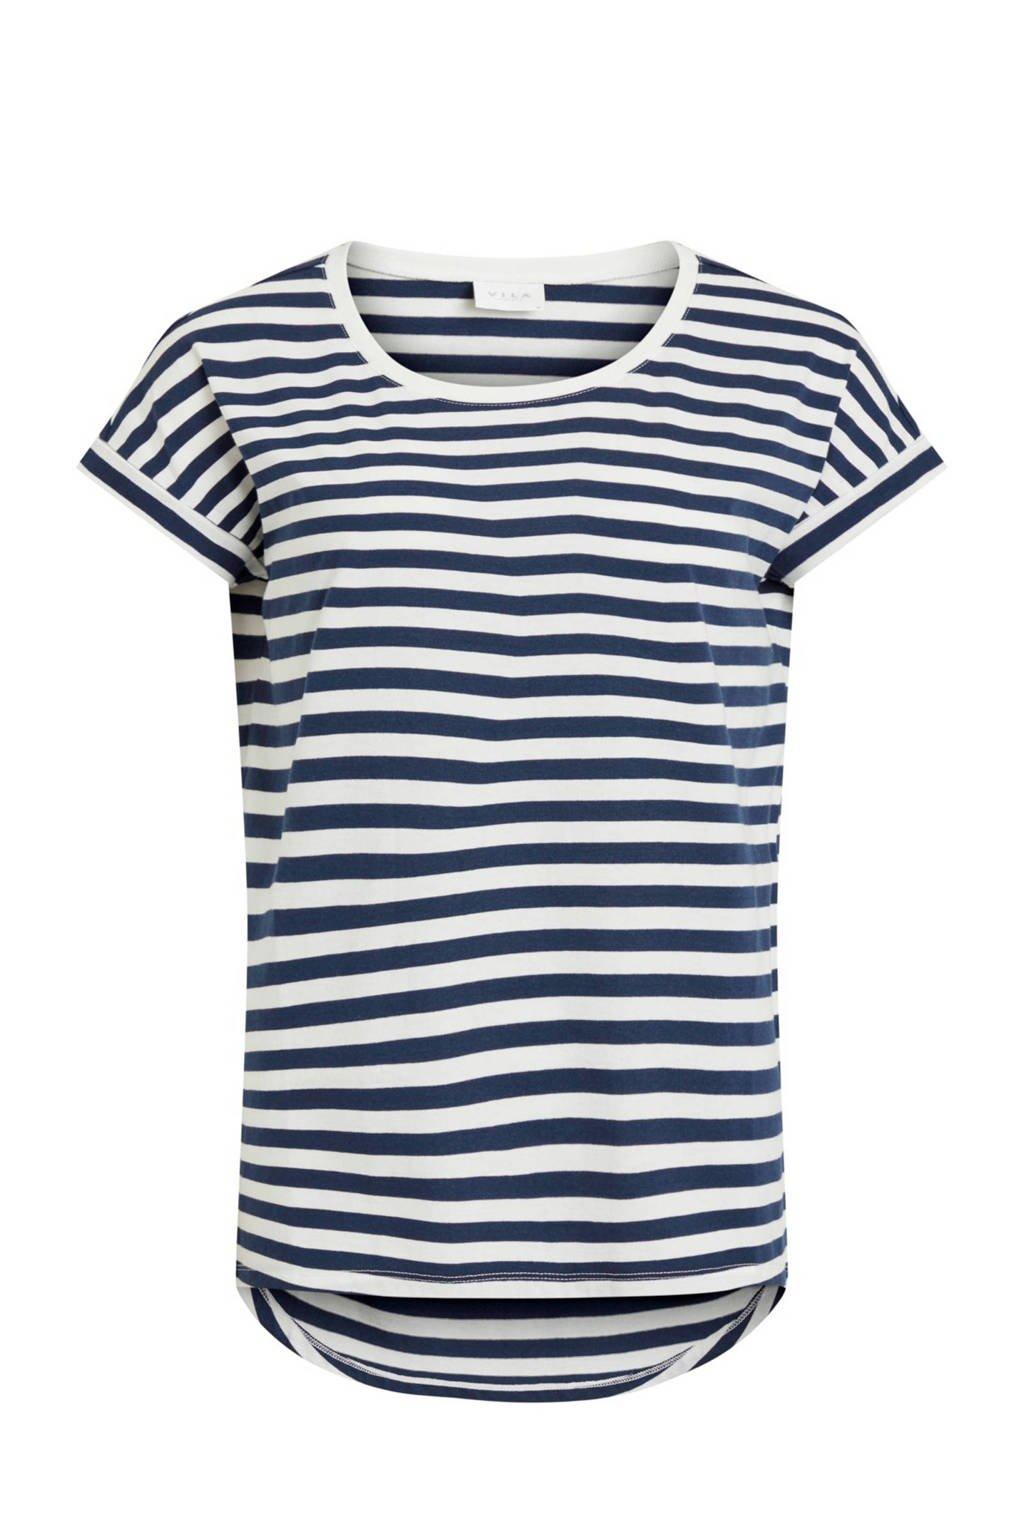 VILA gestreept T-shirt, Blauw/wit